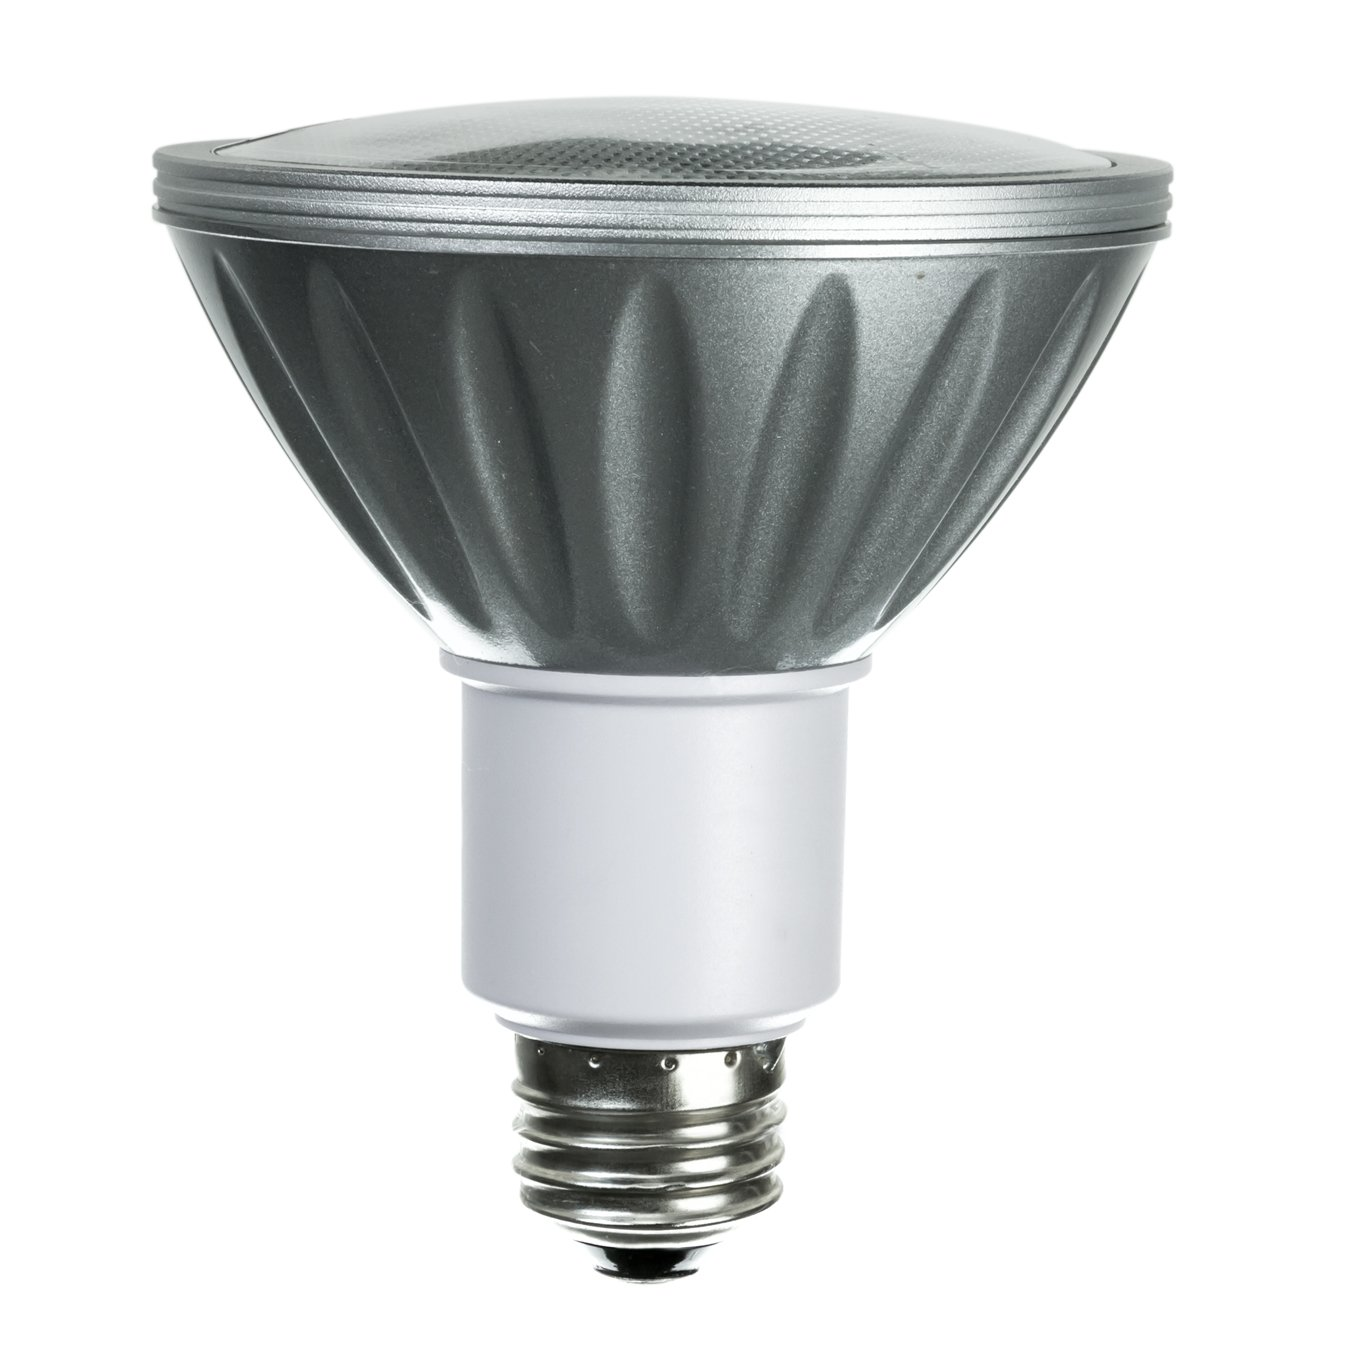 Amazon.com : KOBI ELECTRIC K7L6 12-watt (60-Watt) PAR30 LED 3000K ...